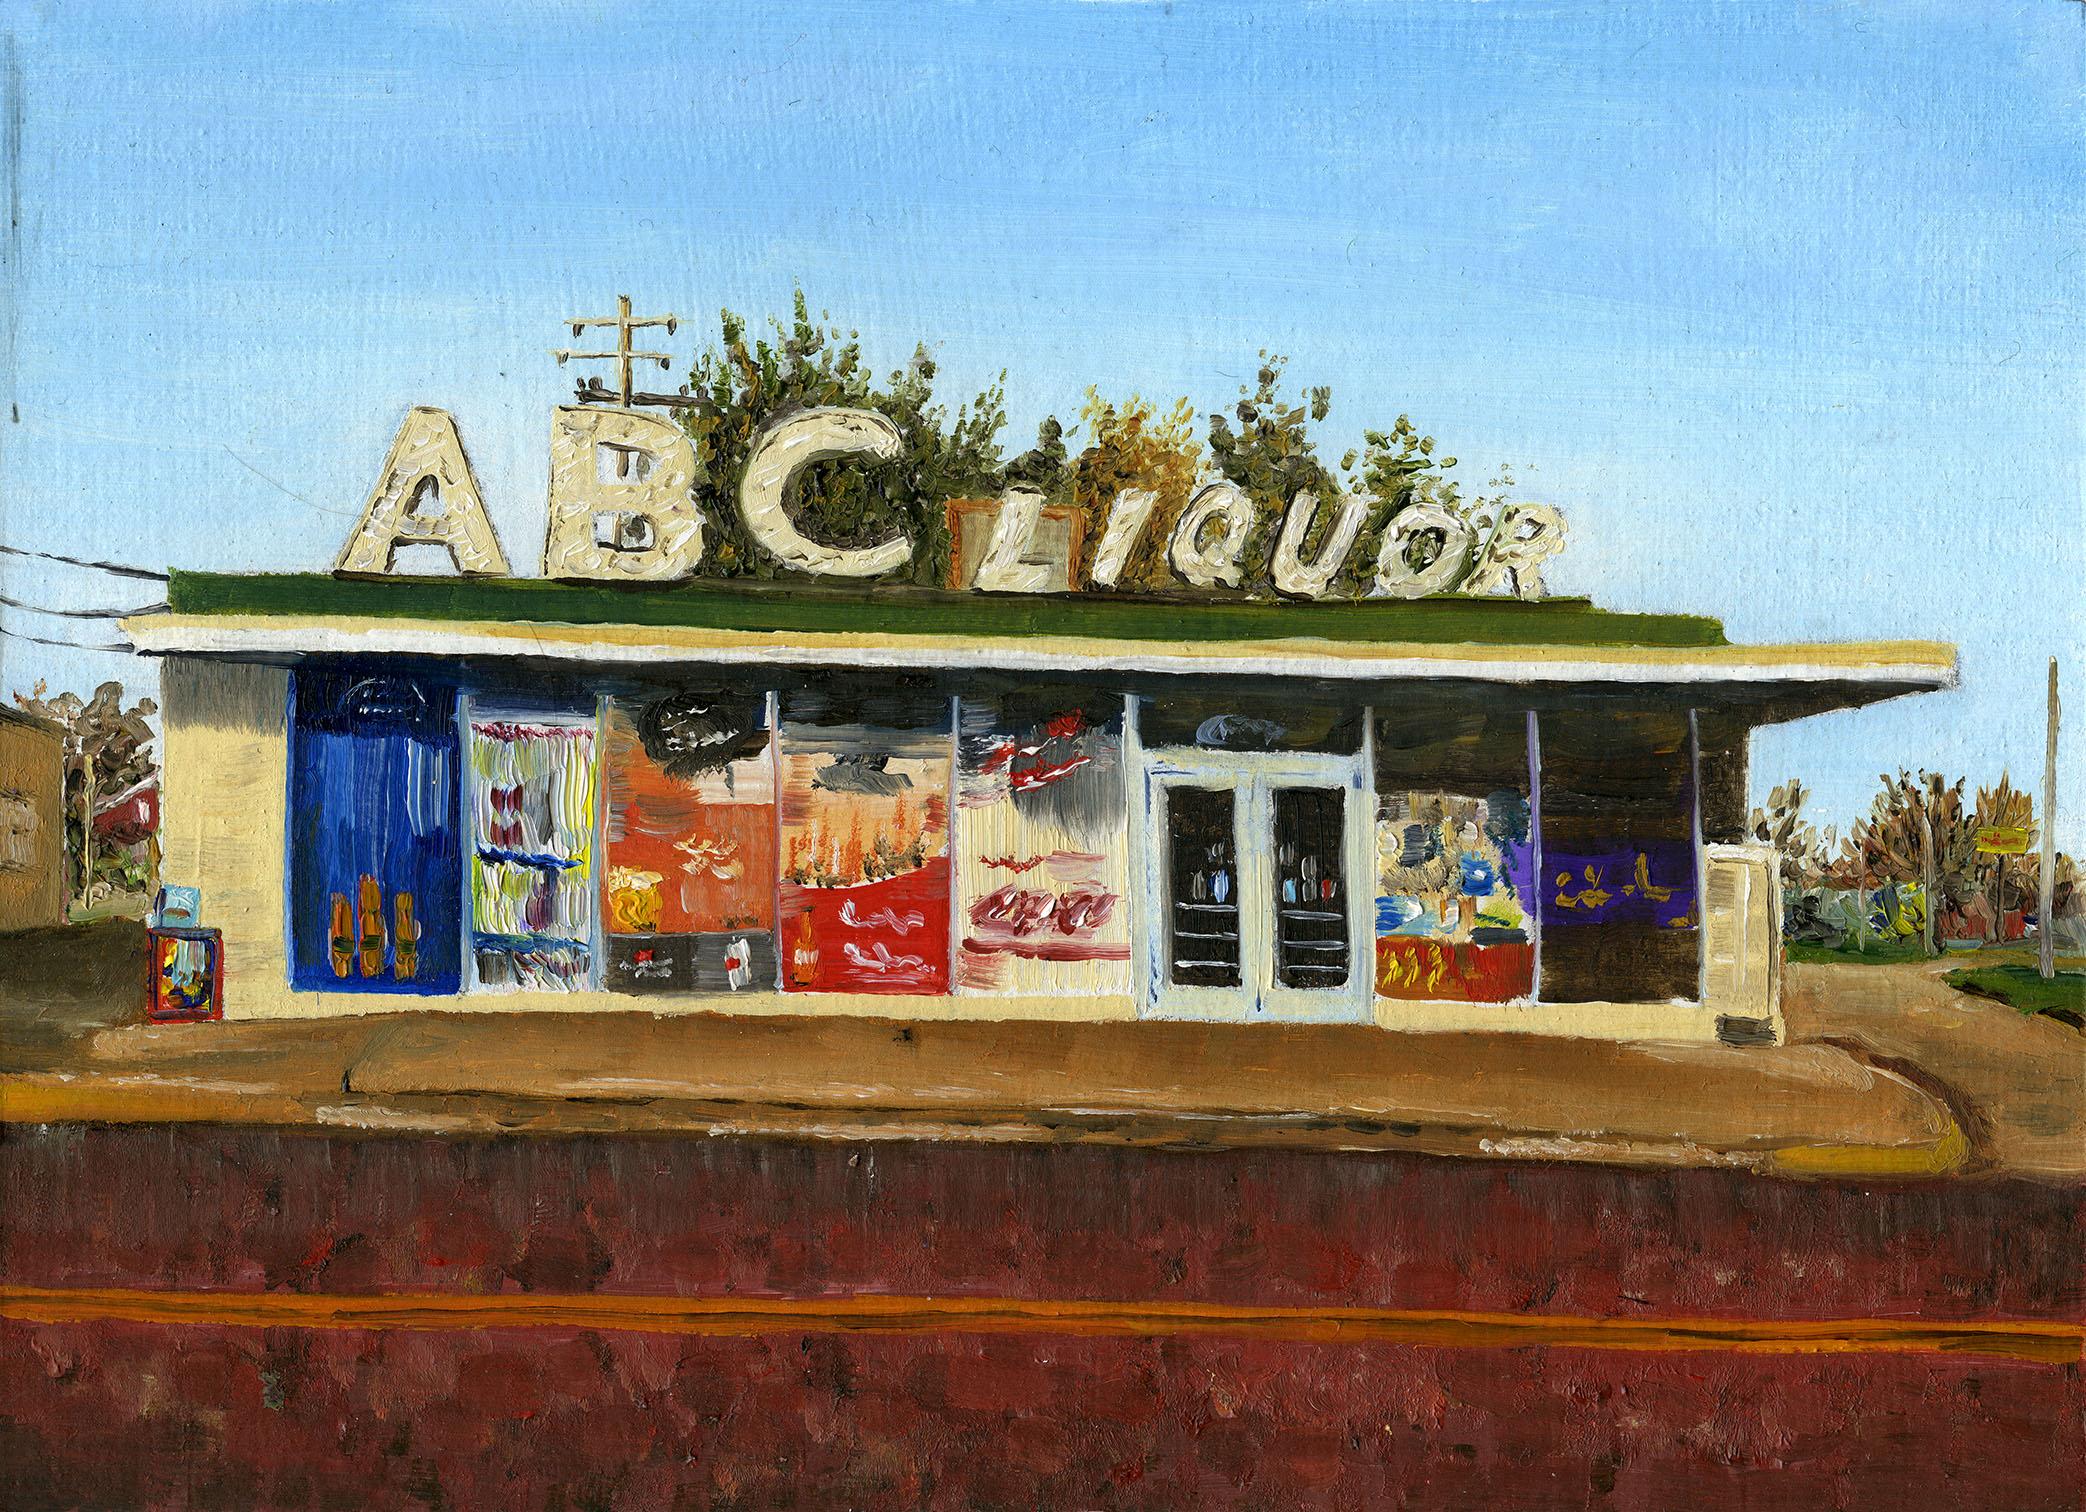 ABC Liquor - Day